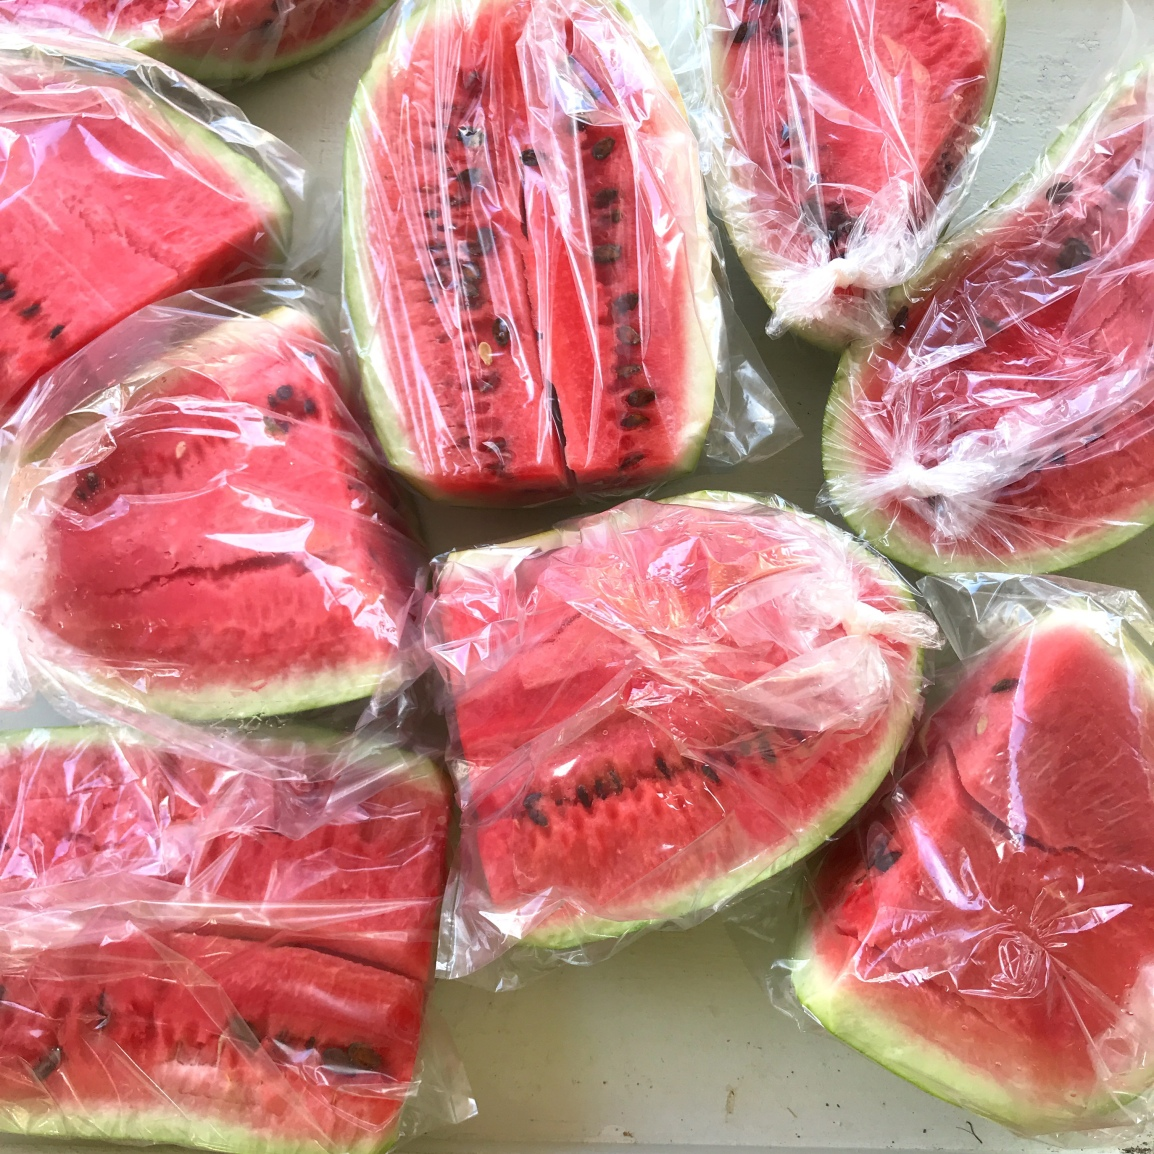 Wednesday ARTfarm Produce Pickups 12/23/20: WintaWhattaMELON!*